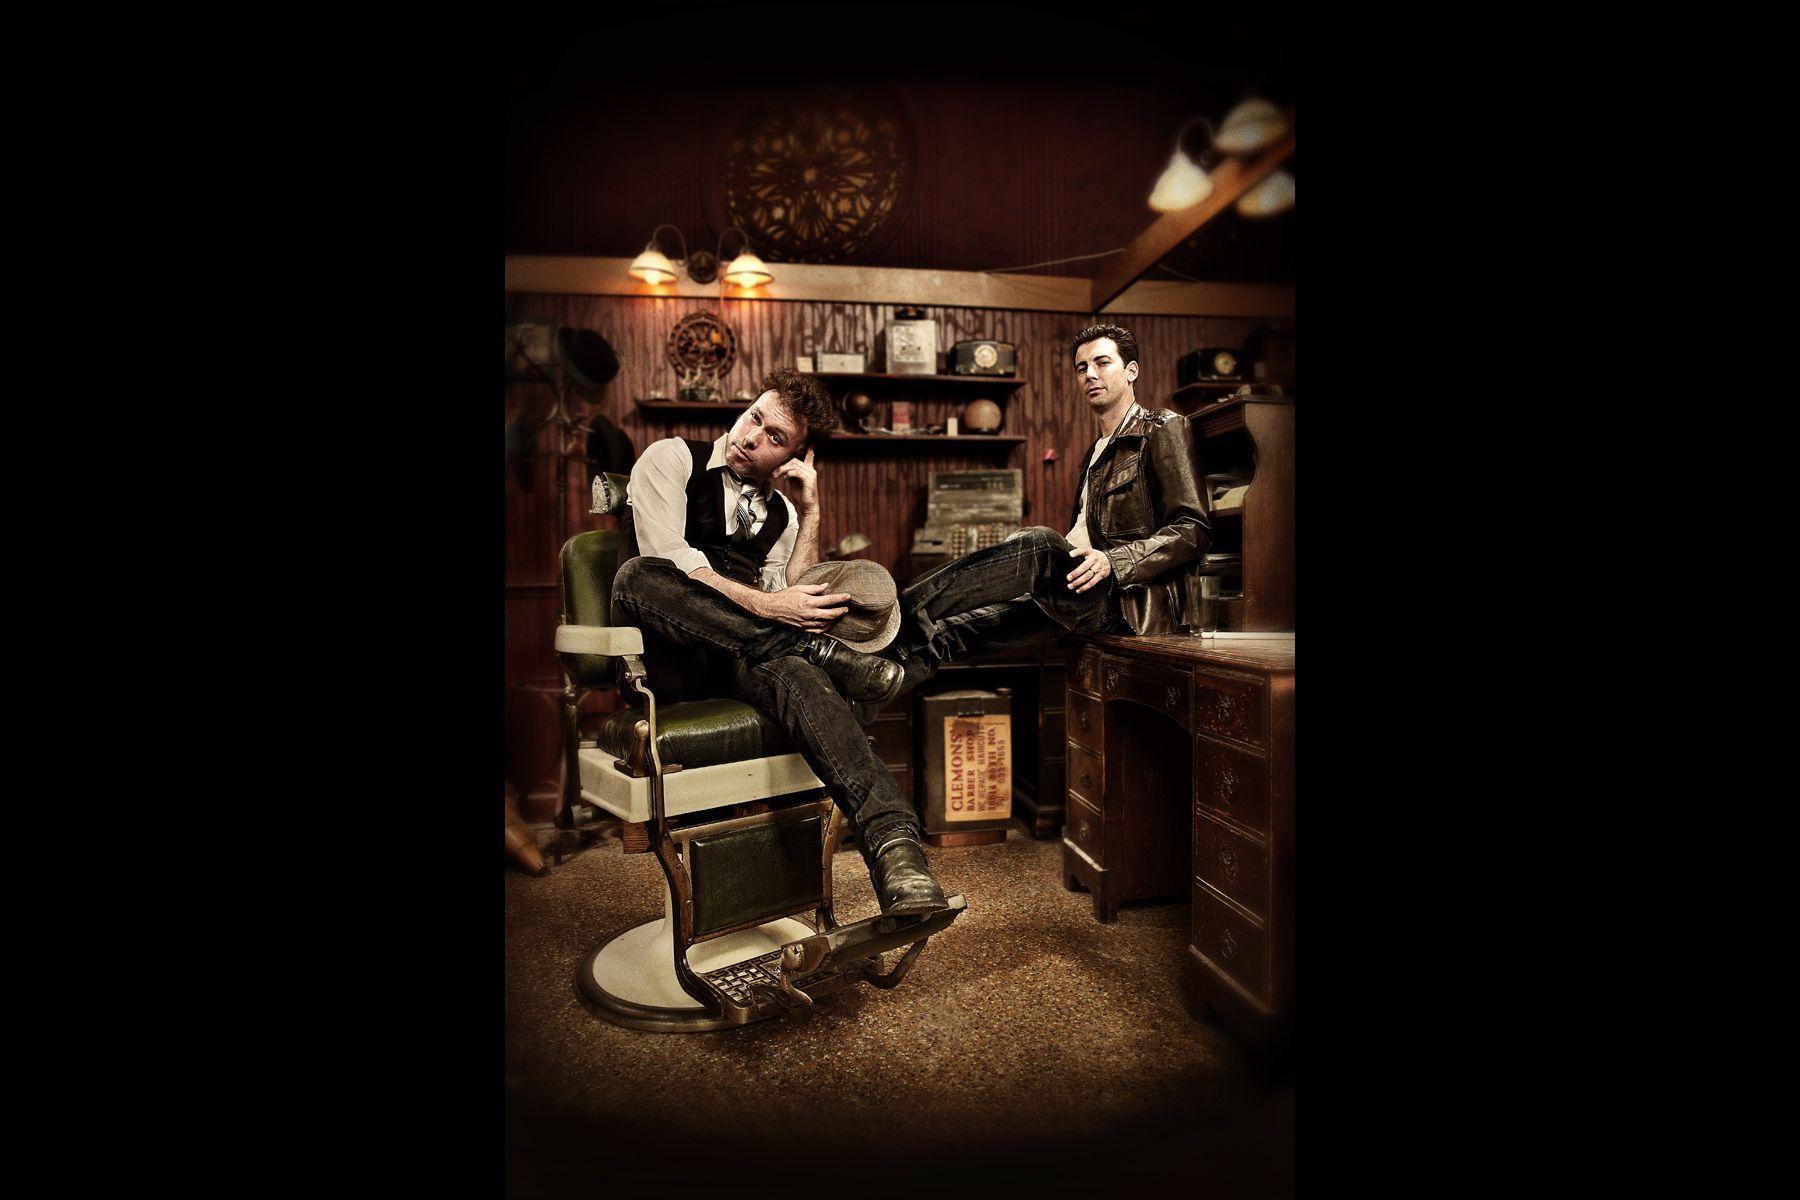 1nfw__november_foxtrot_whiskey__rock_n_roll__aaron_lepley__damon_dougherty.jpg